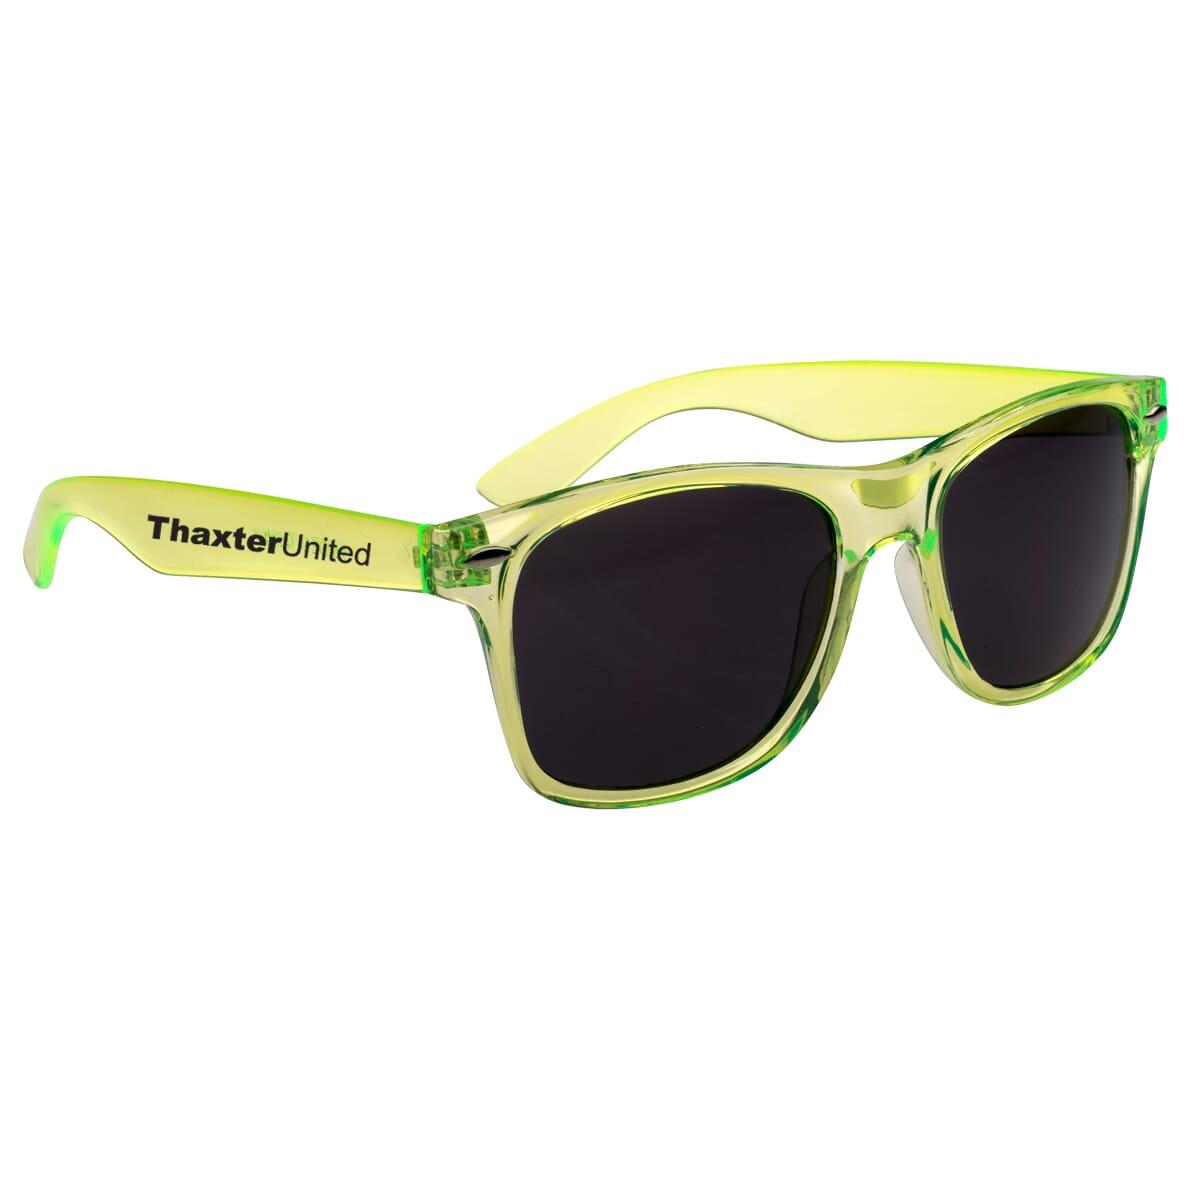 Retro sunglasses with translucent yellow frames